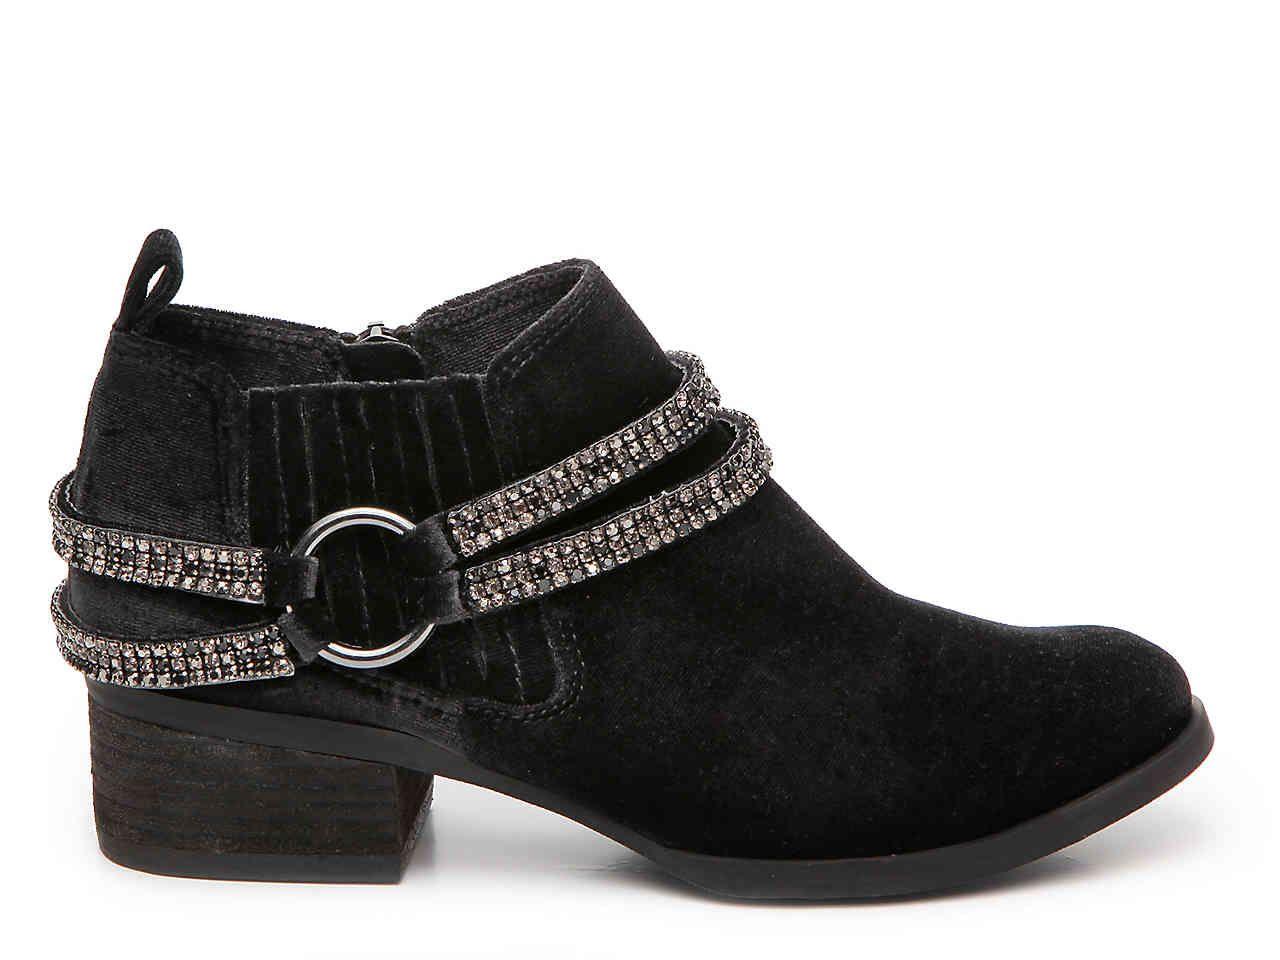 aa0c8f49a468 Not Rated Nelia Velvet Bootie Women s Shoes